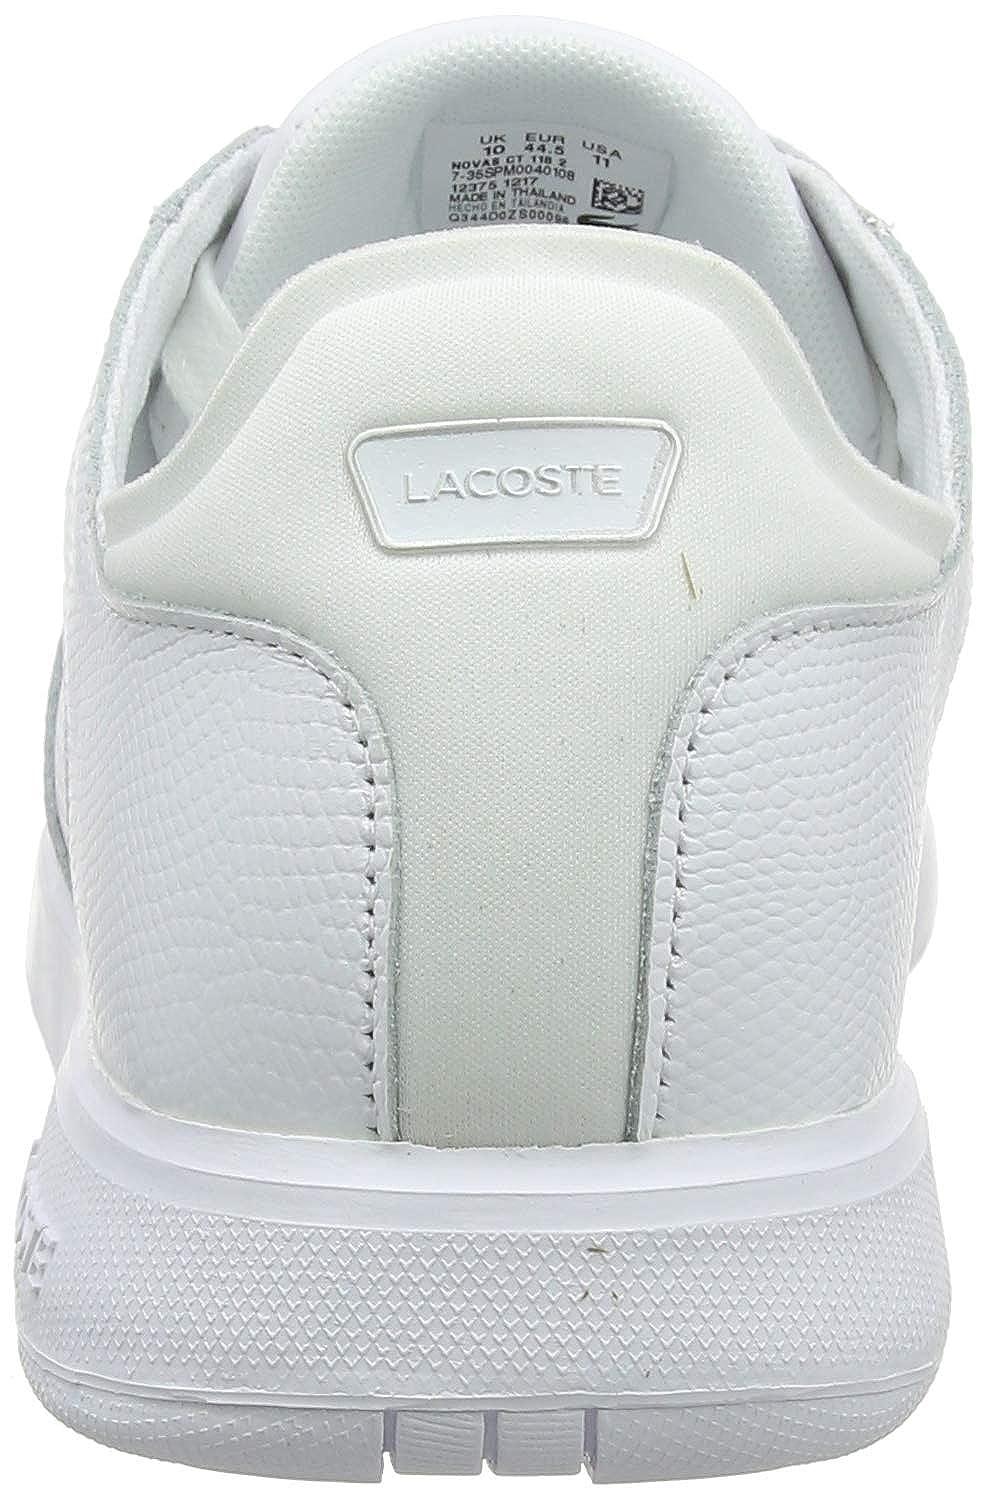 Lacoste Novas CT 118 2 Spm004010881. Baskets Homme. White